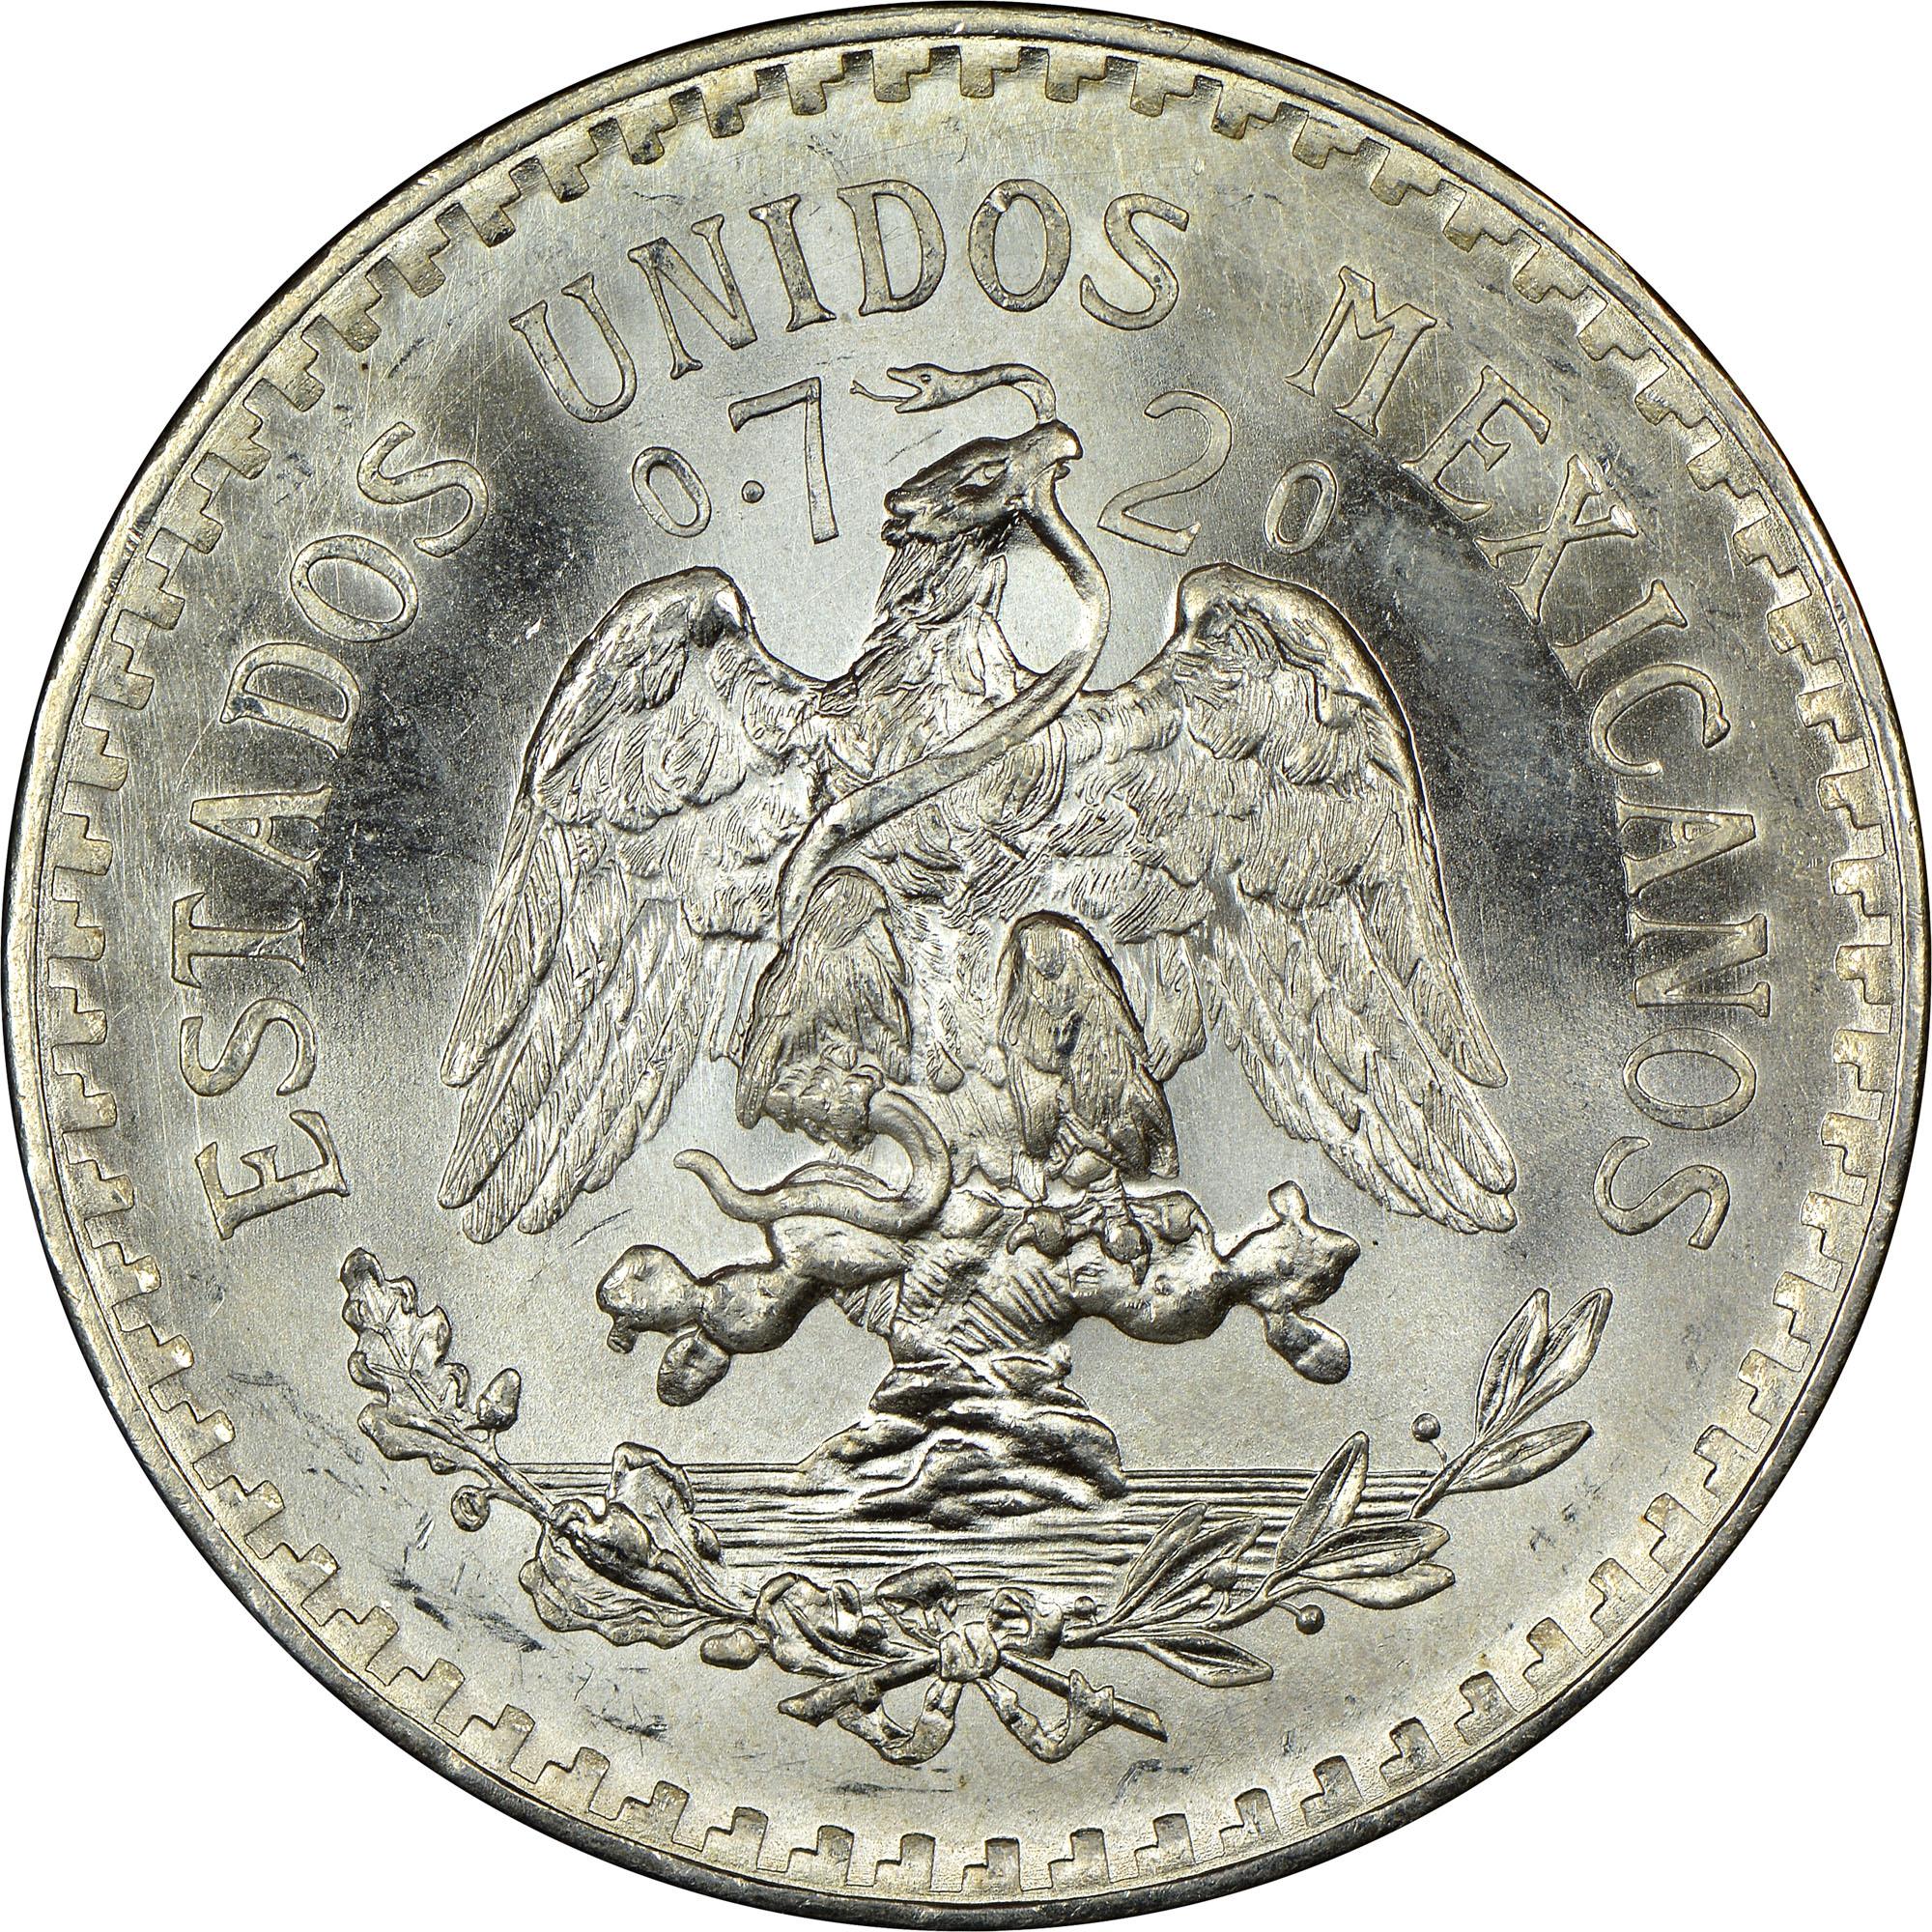 1920 1945 Mexico Estados Unidos Mexicanos Peso Km 455